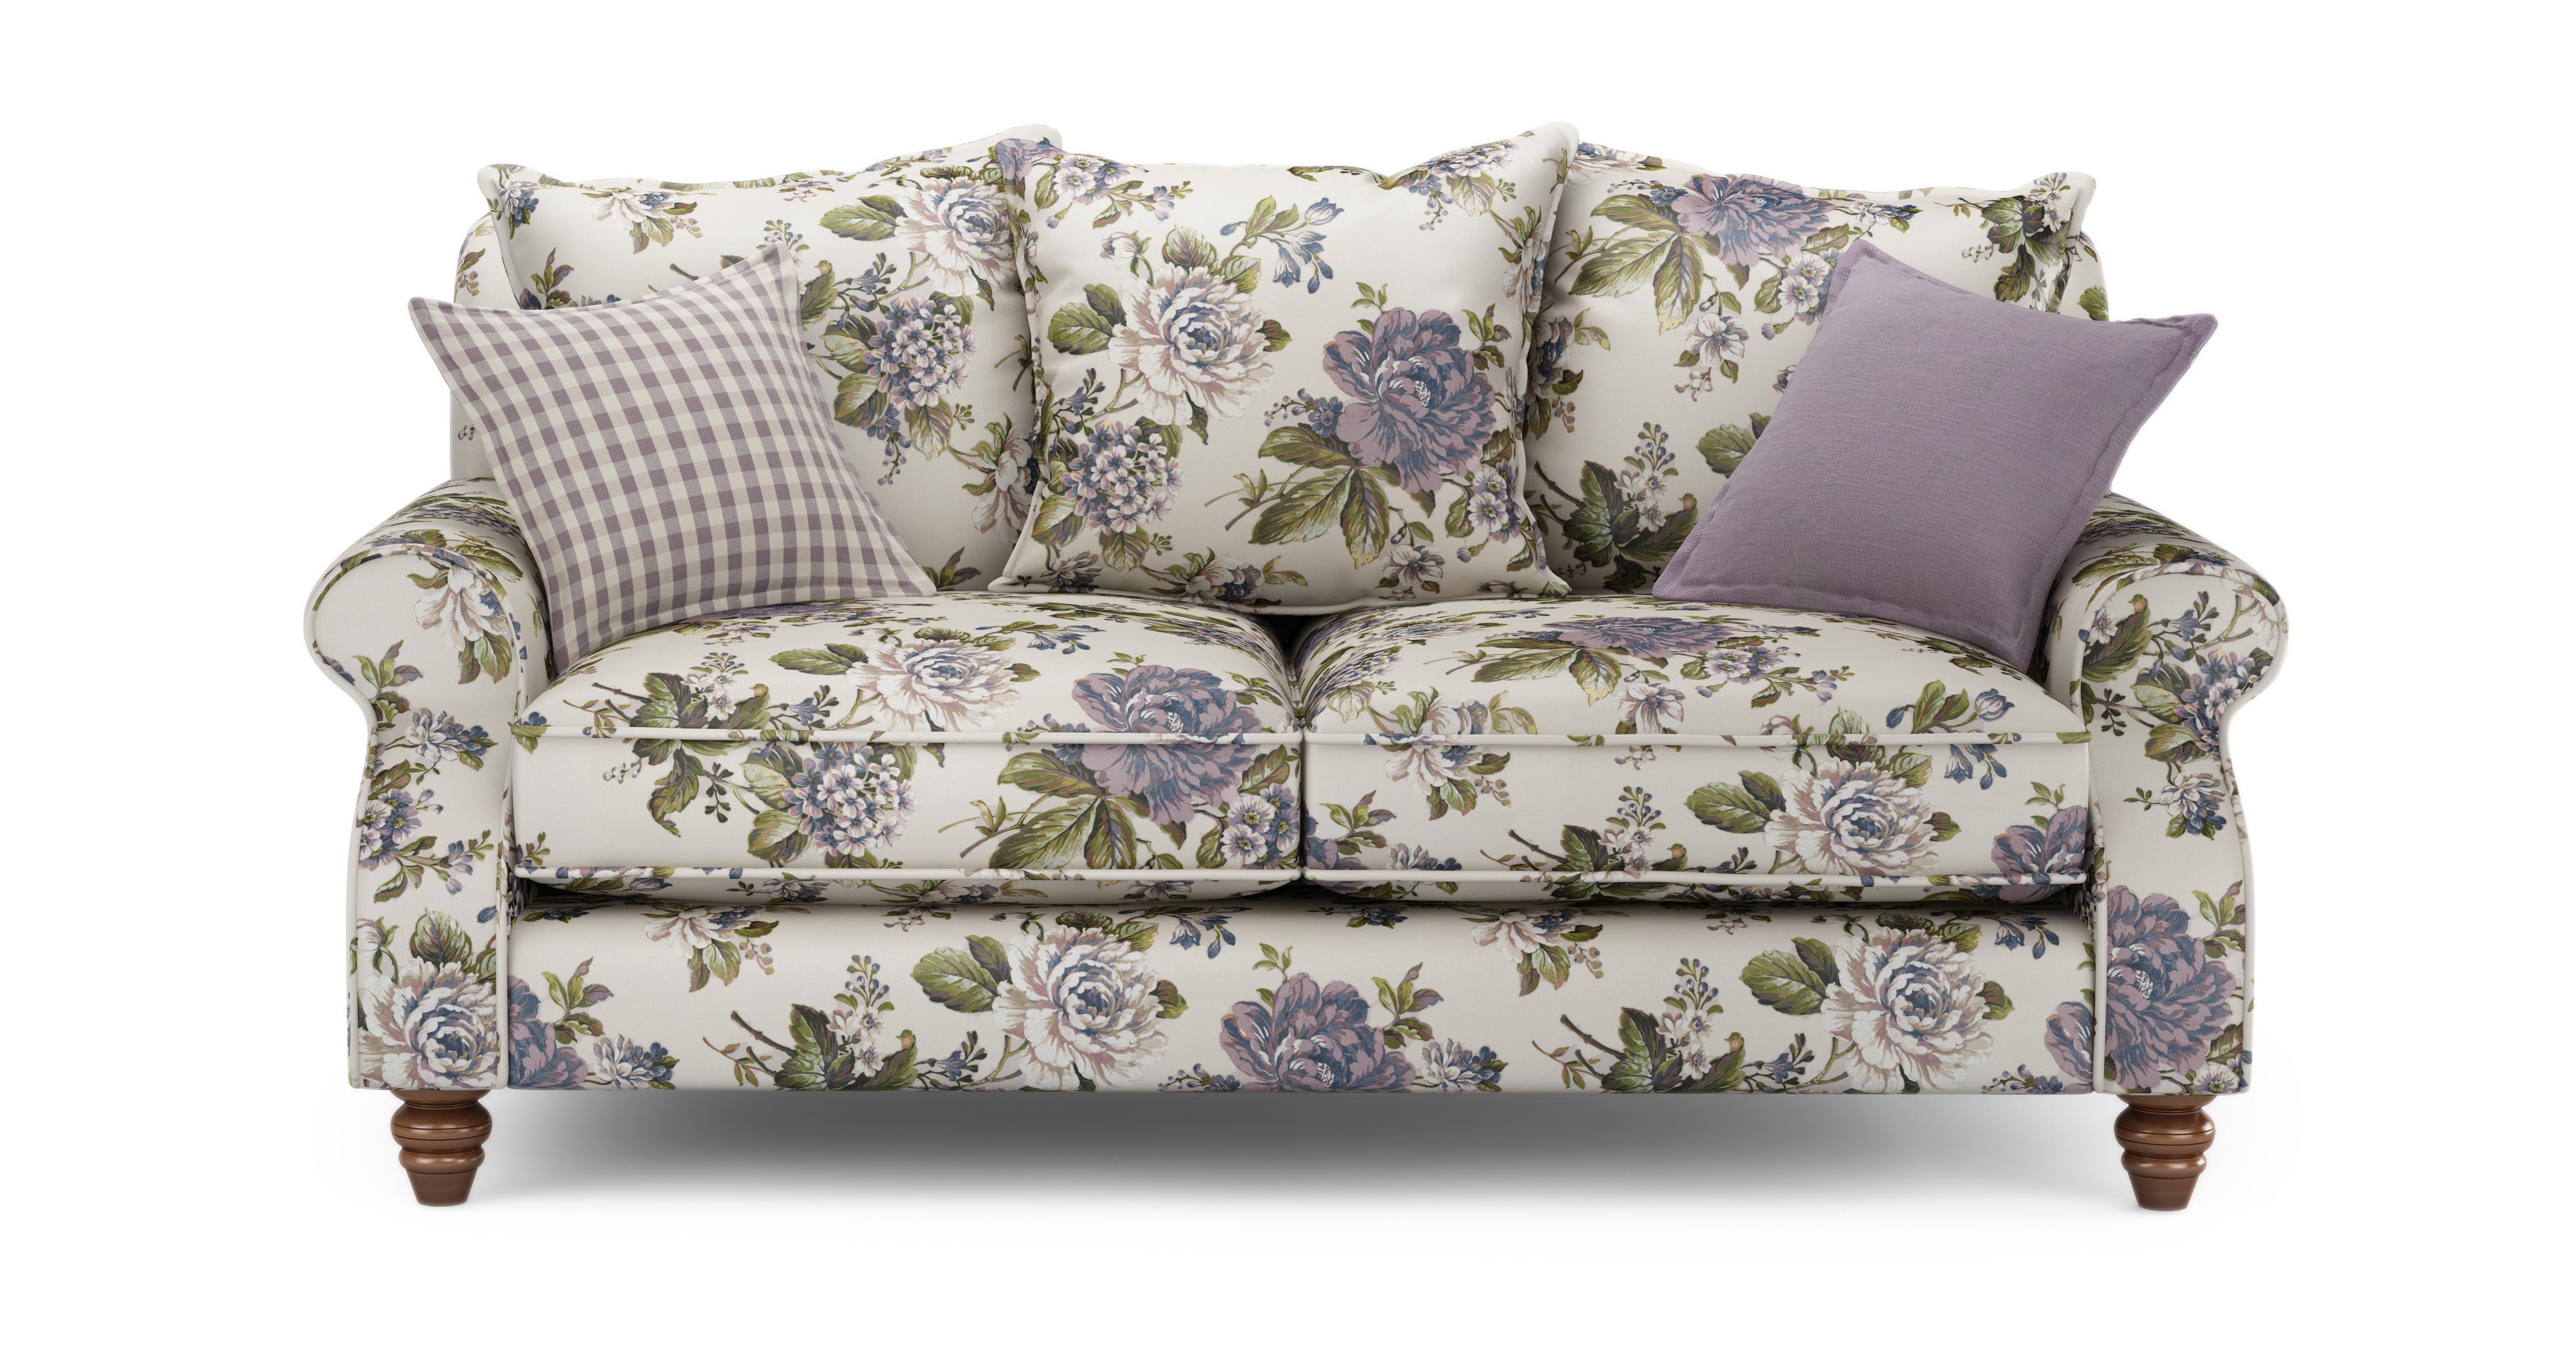 Ellie Floral 2 Seater Sofa Ellie Floral Dfs Ireland